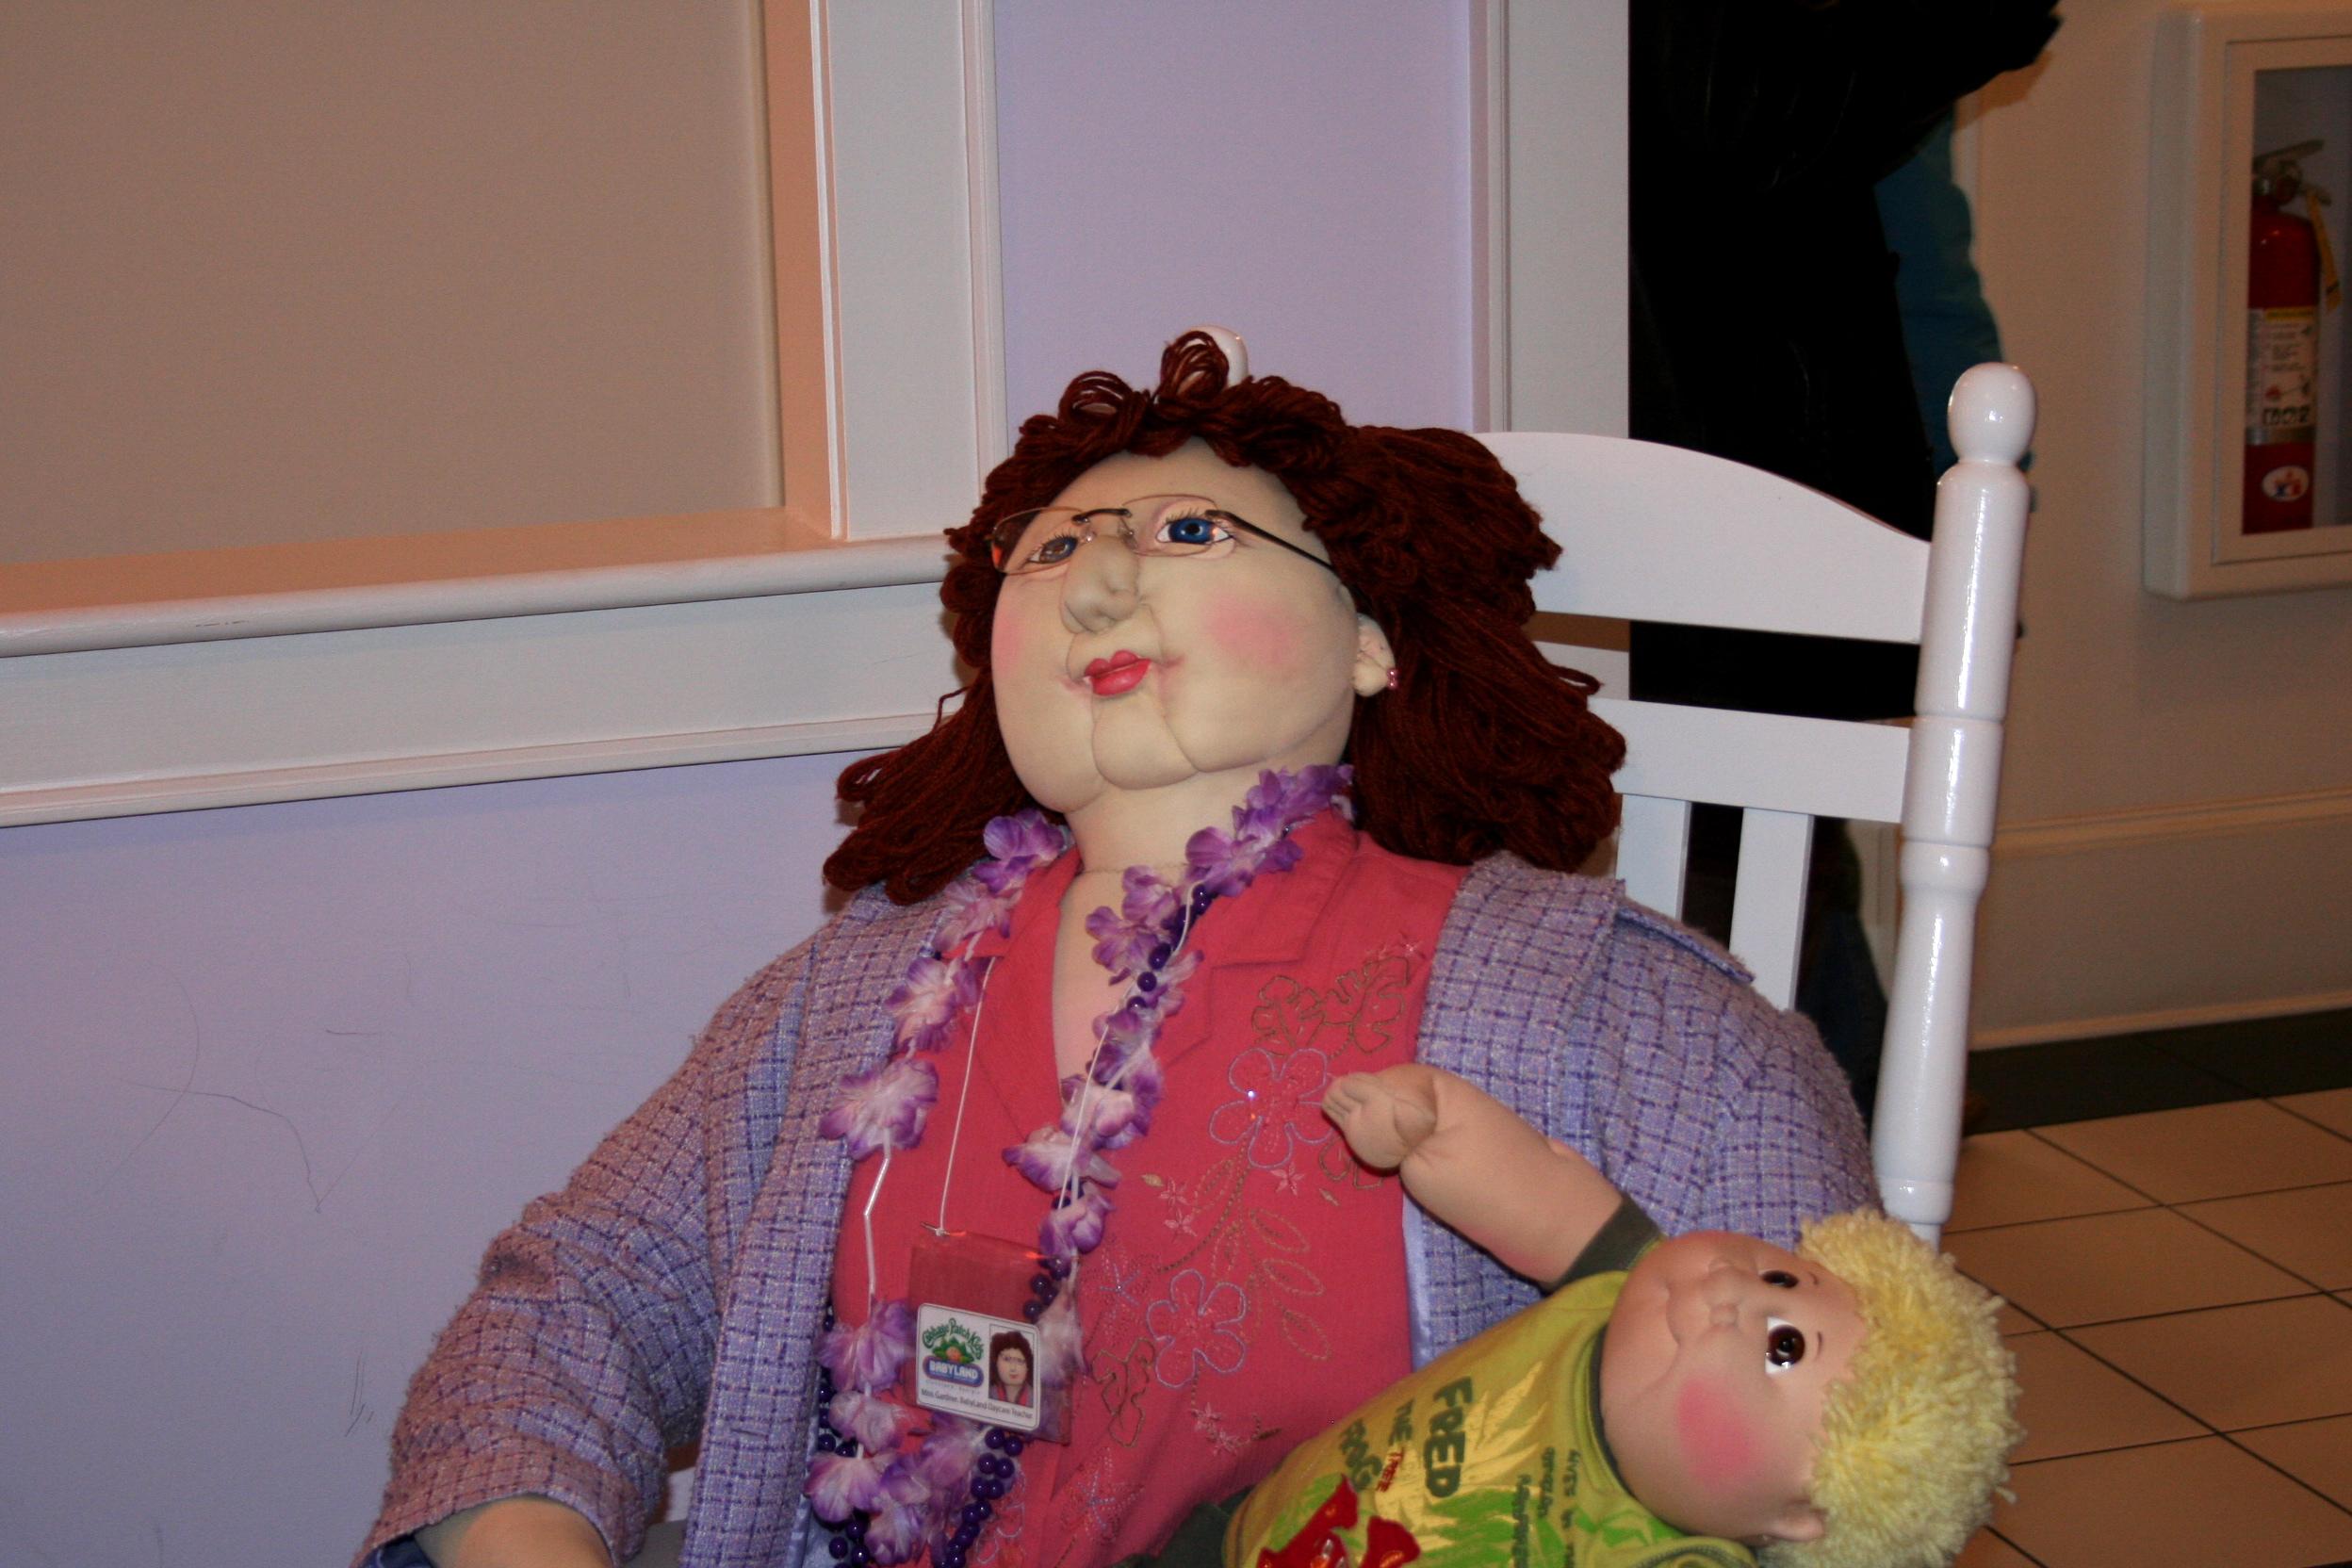 This is a creepy stuffed nurse doll.